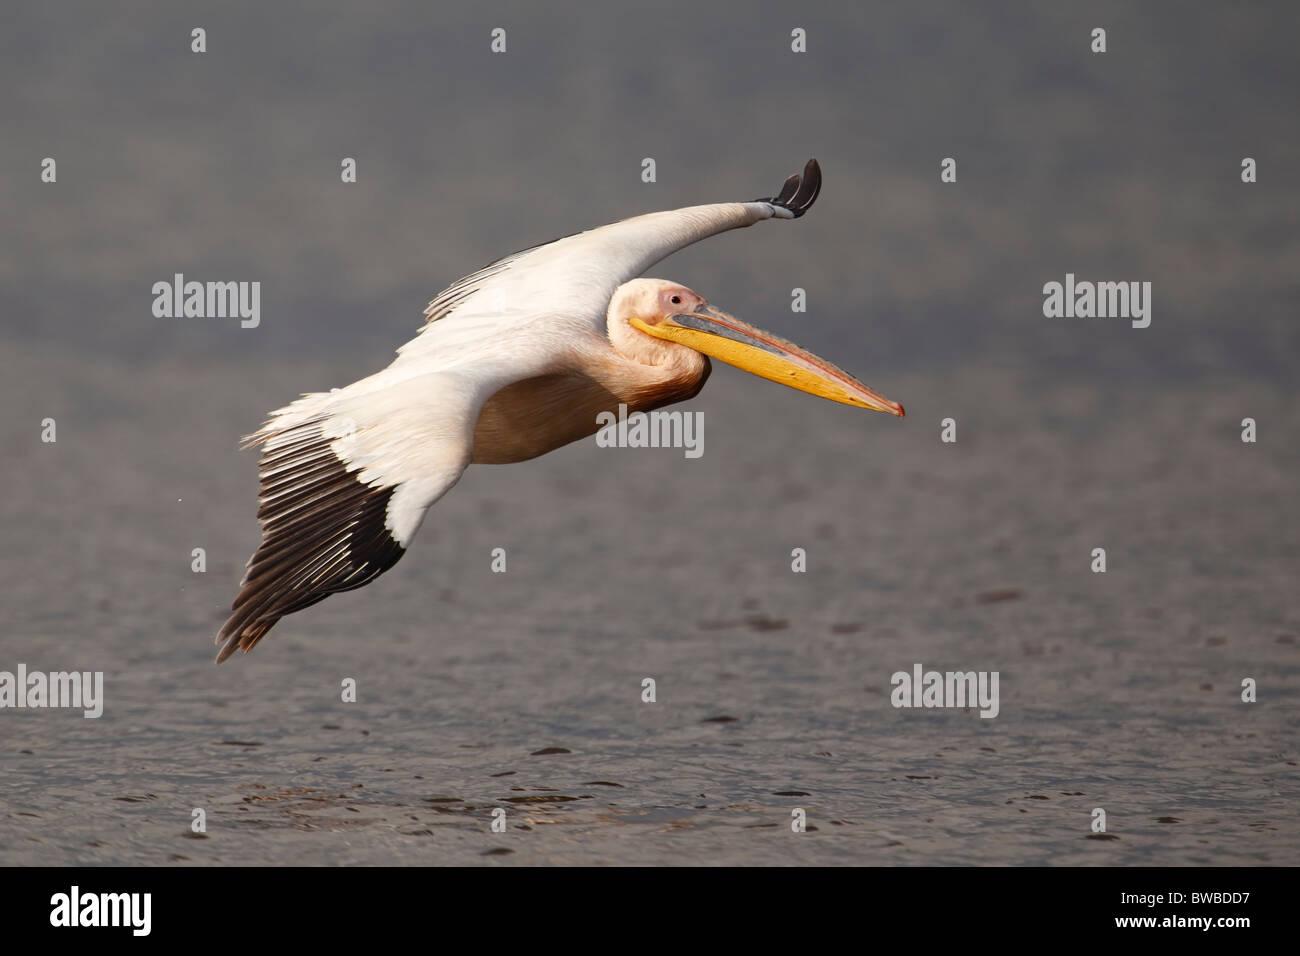 Great White Pelican in flight, Lake Nakuru Nationalpark, Kenya. - Stock Image